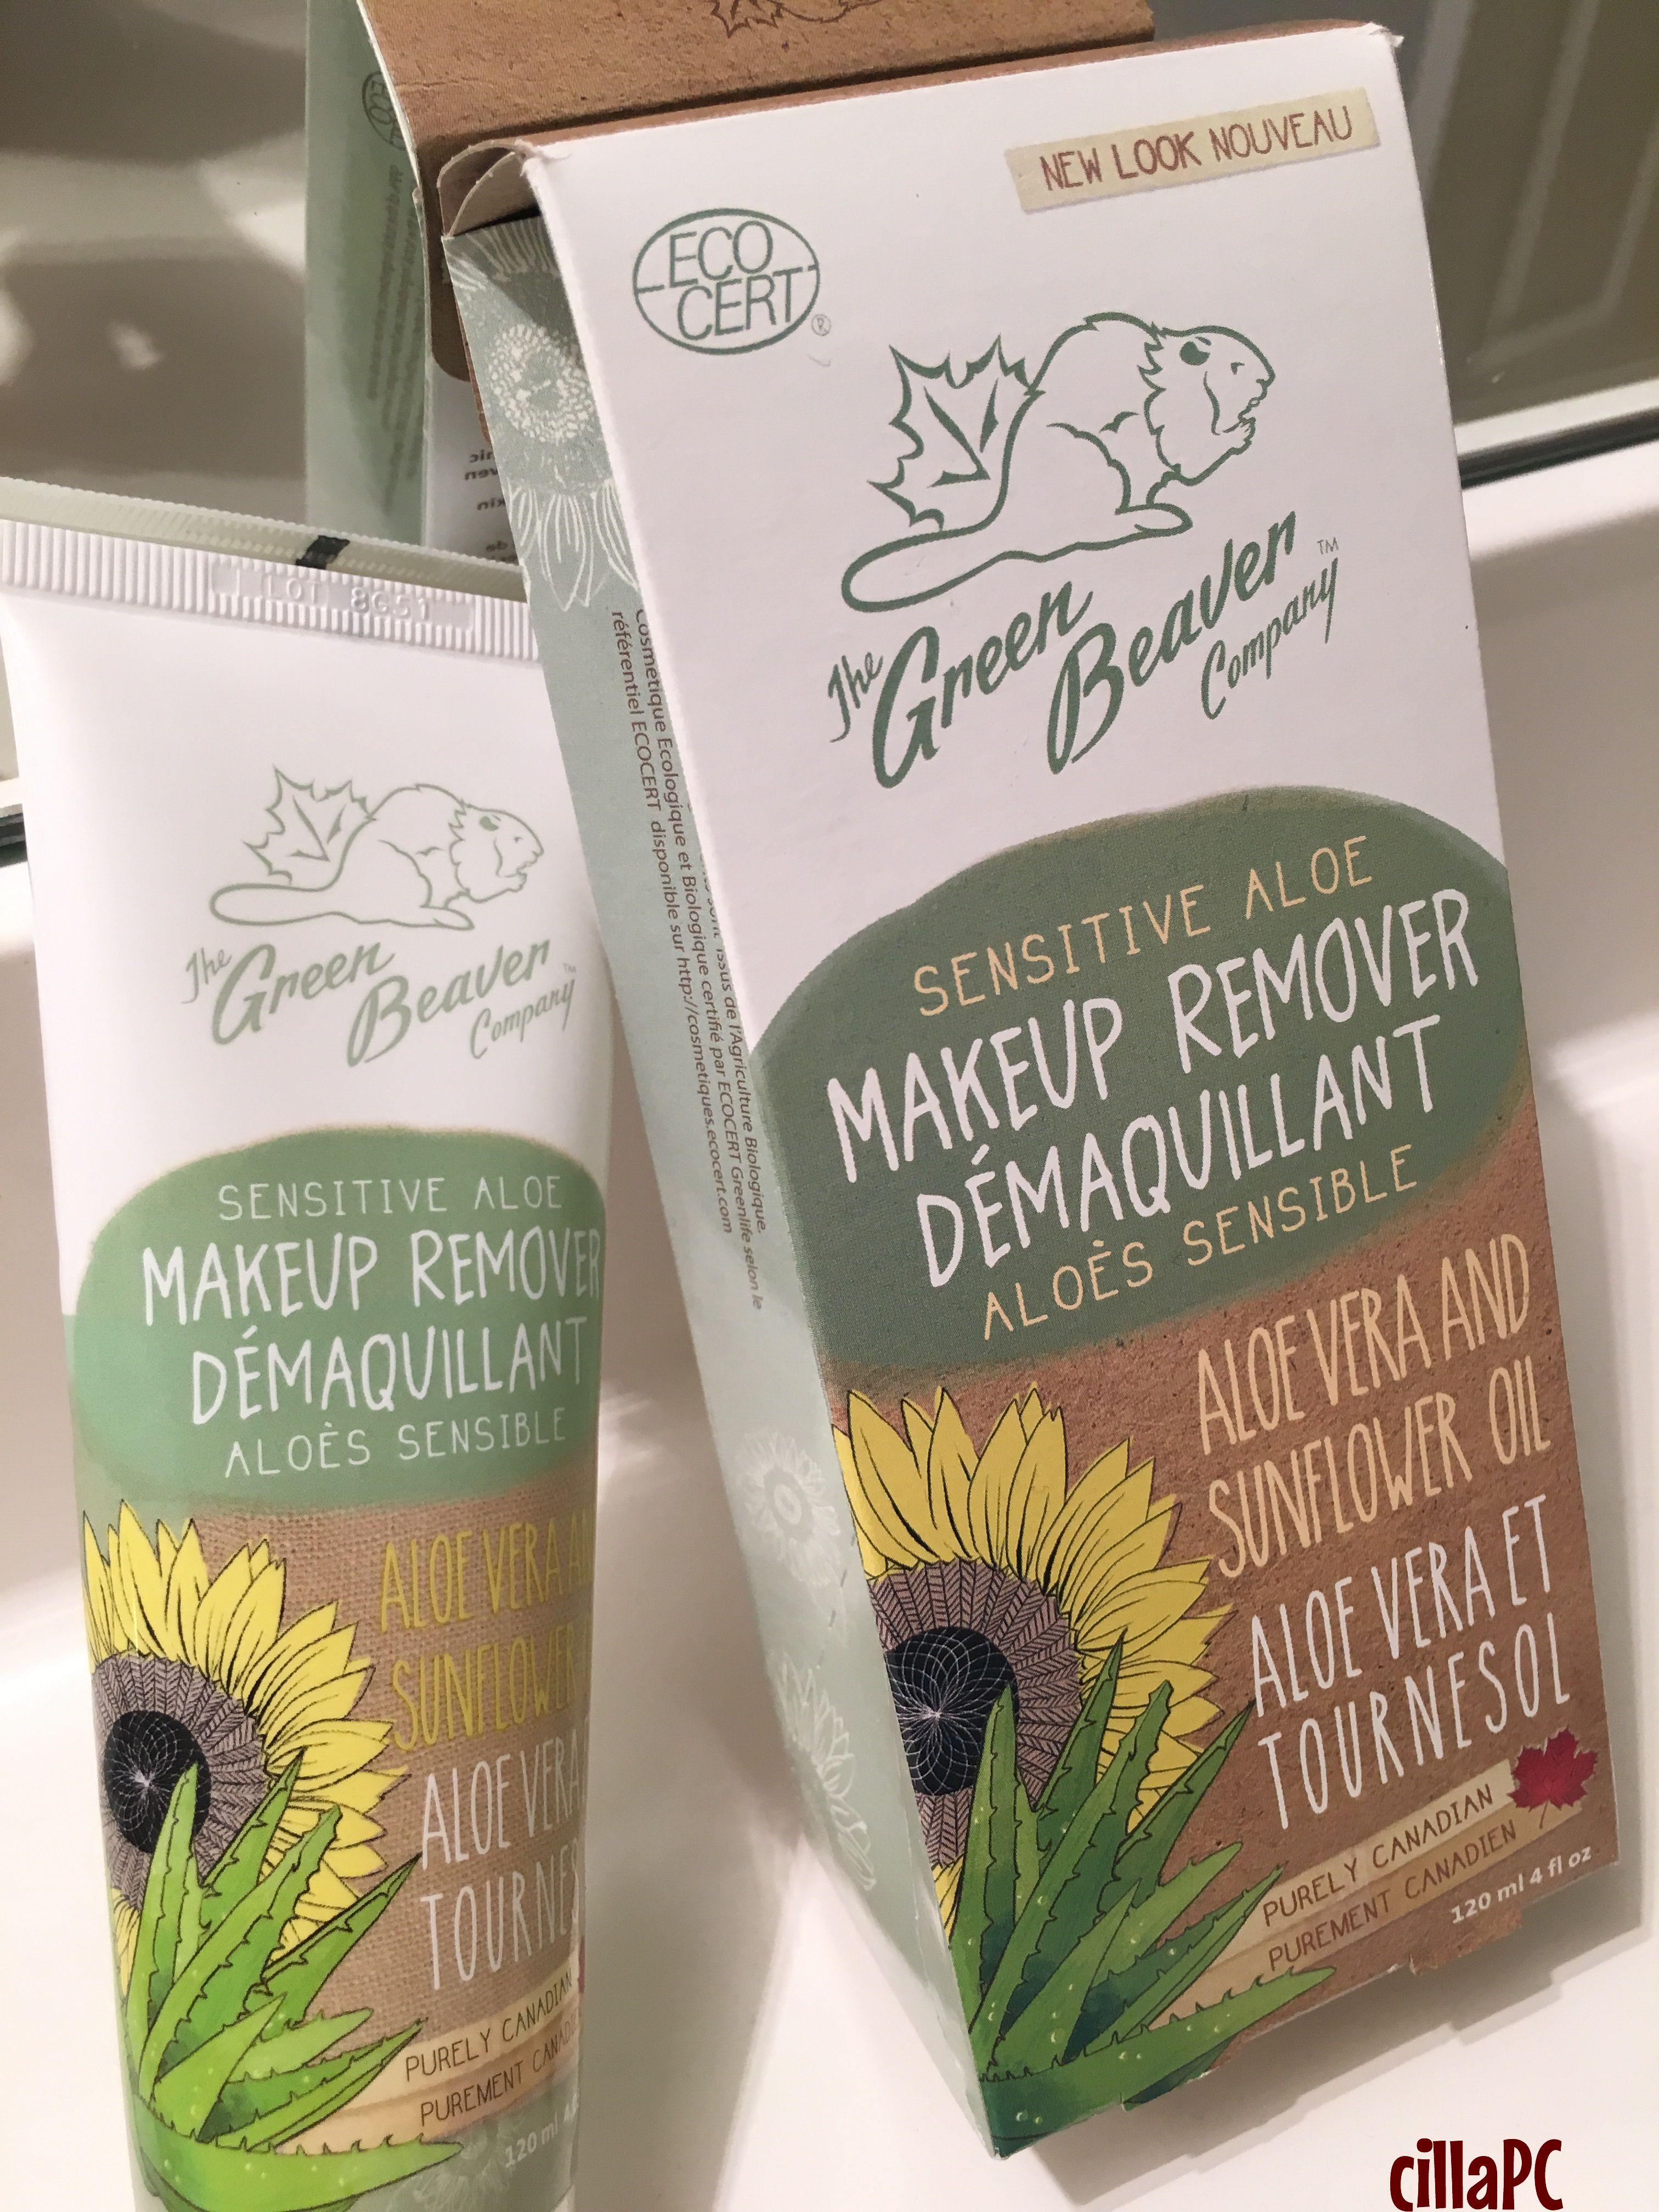 Natural Makeup Remover 7 methods using just 1 ingredient